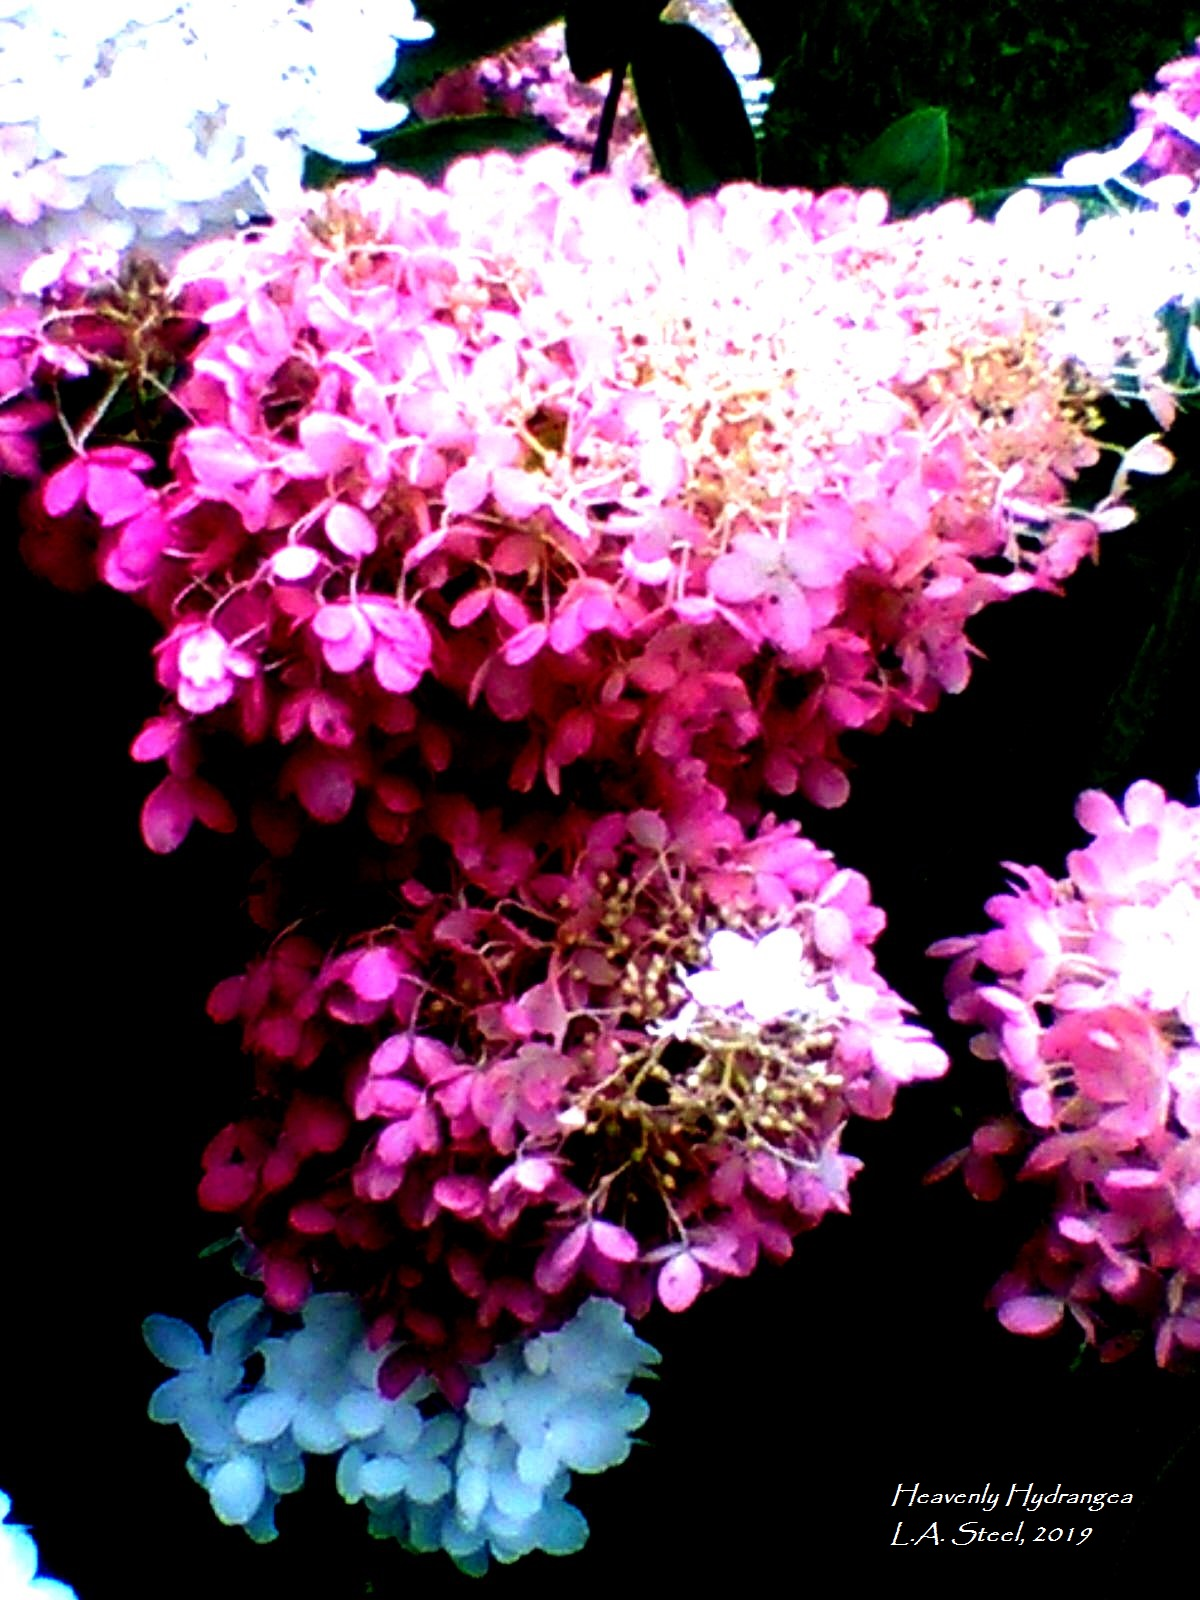 heavenly hydrangea 9 2019